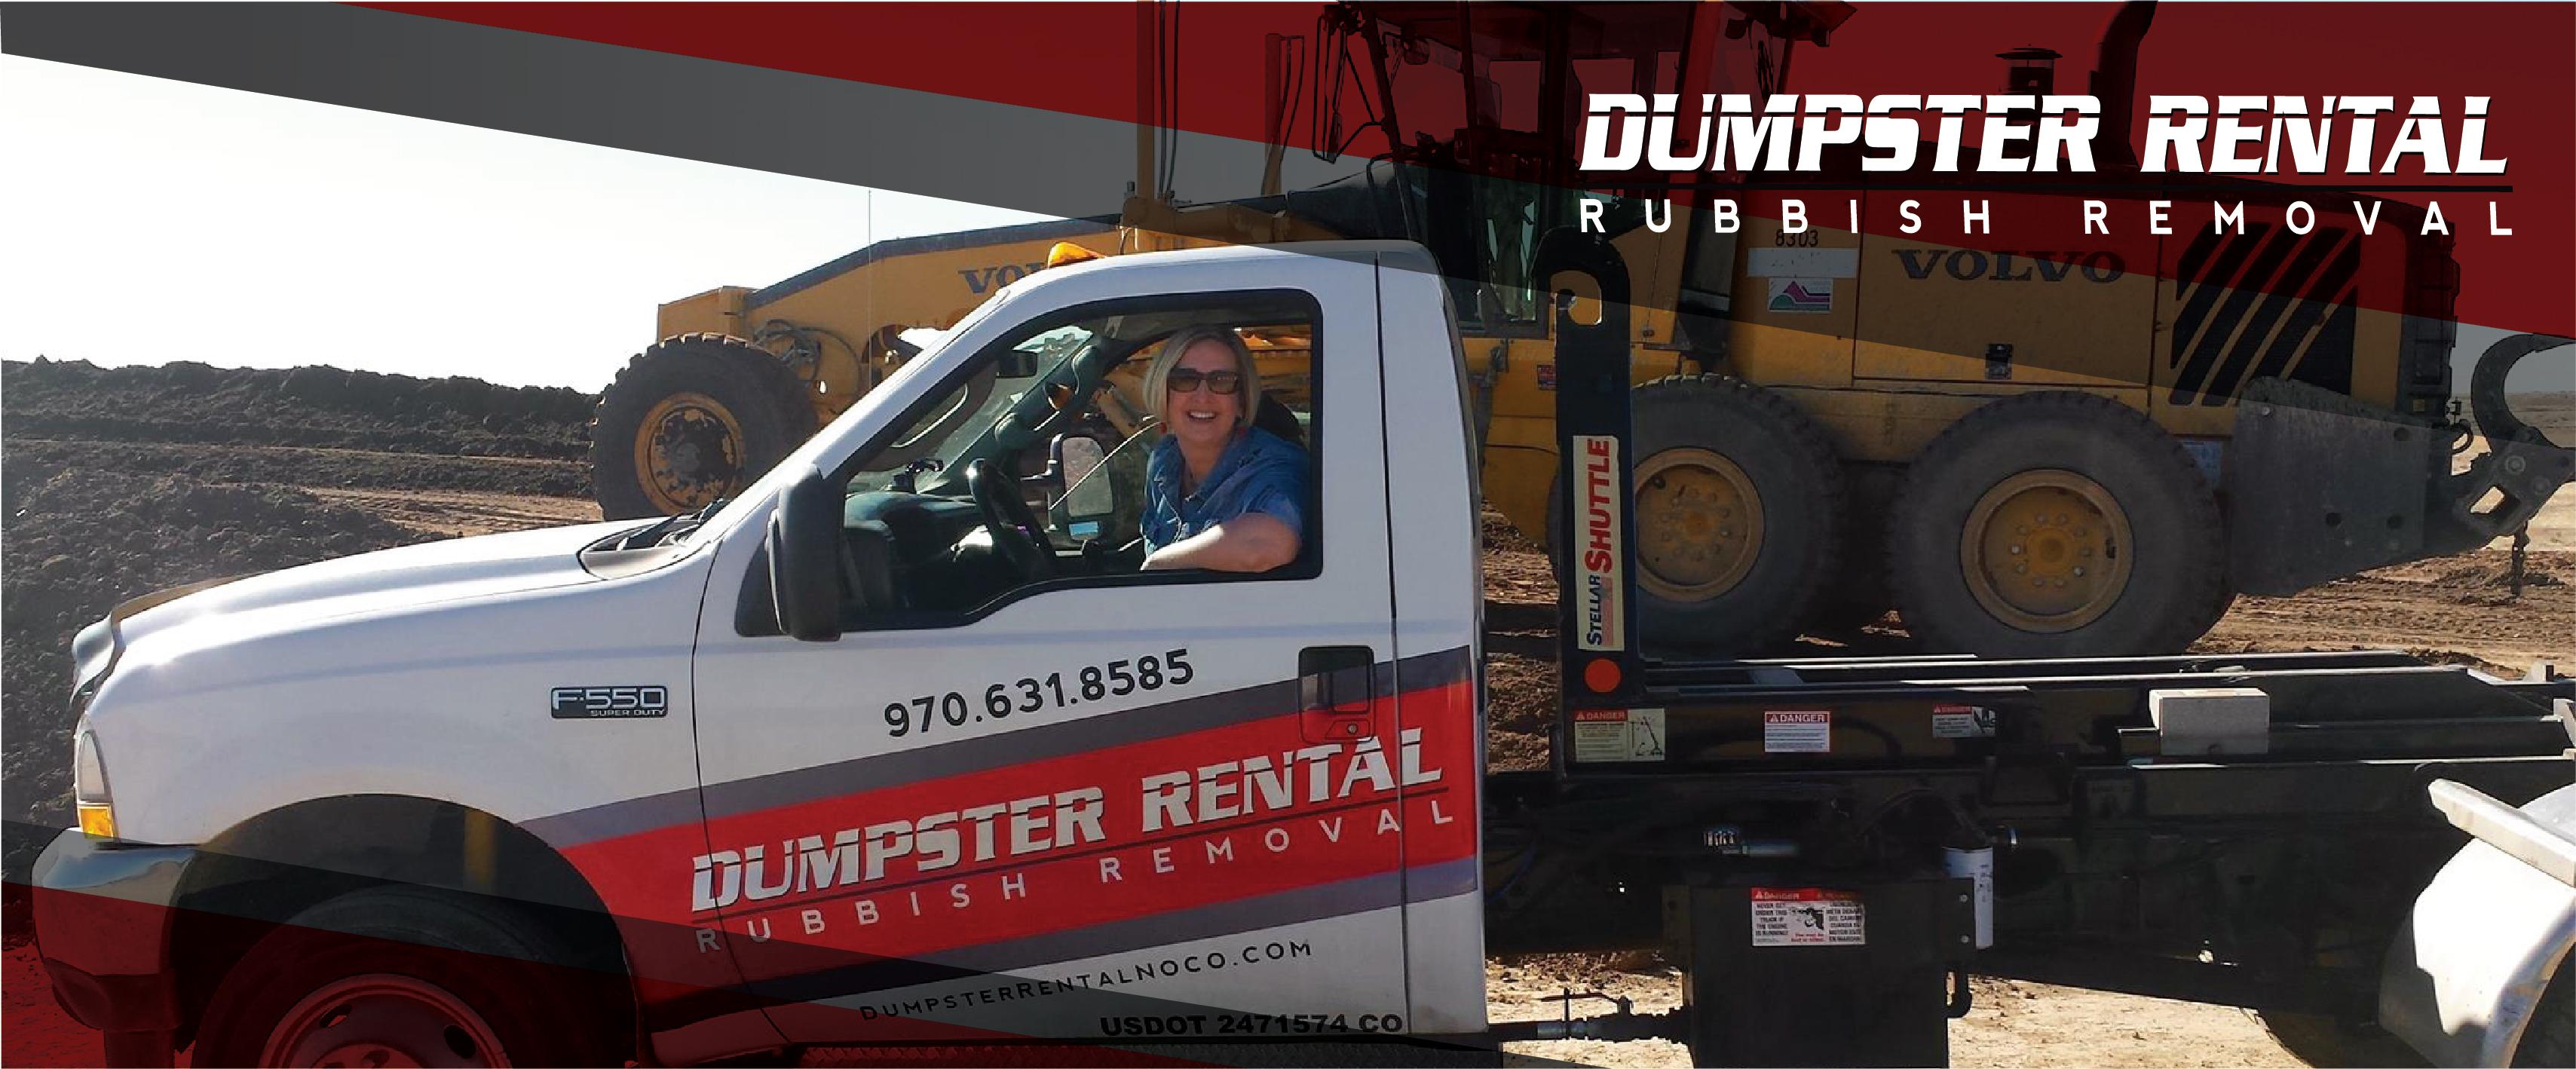 local Fort Collins Dumpster Rental